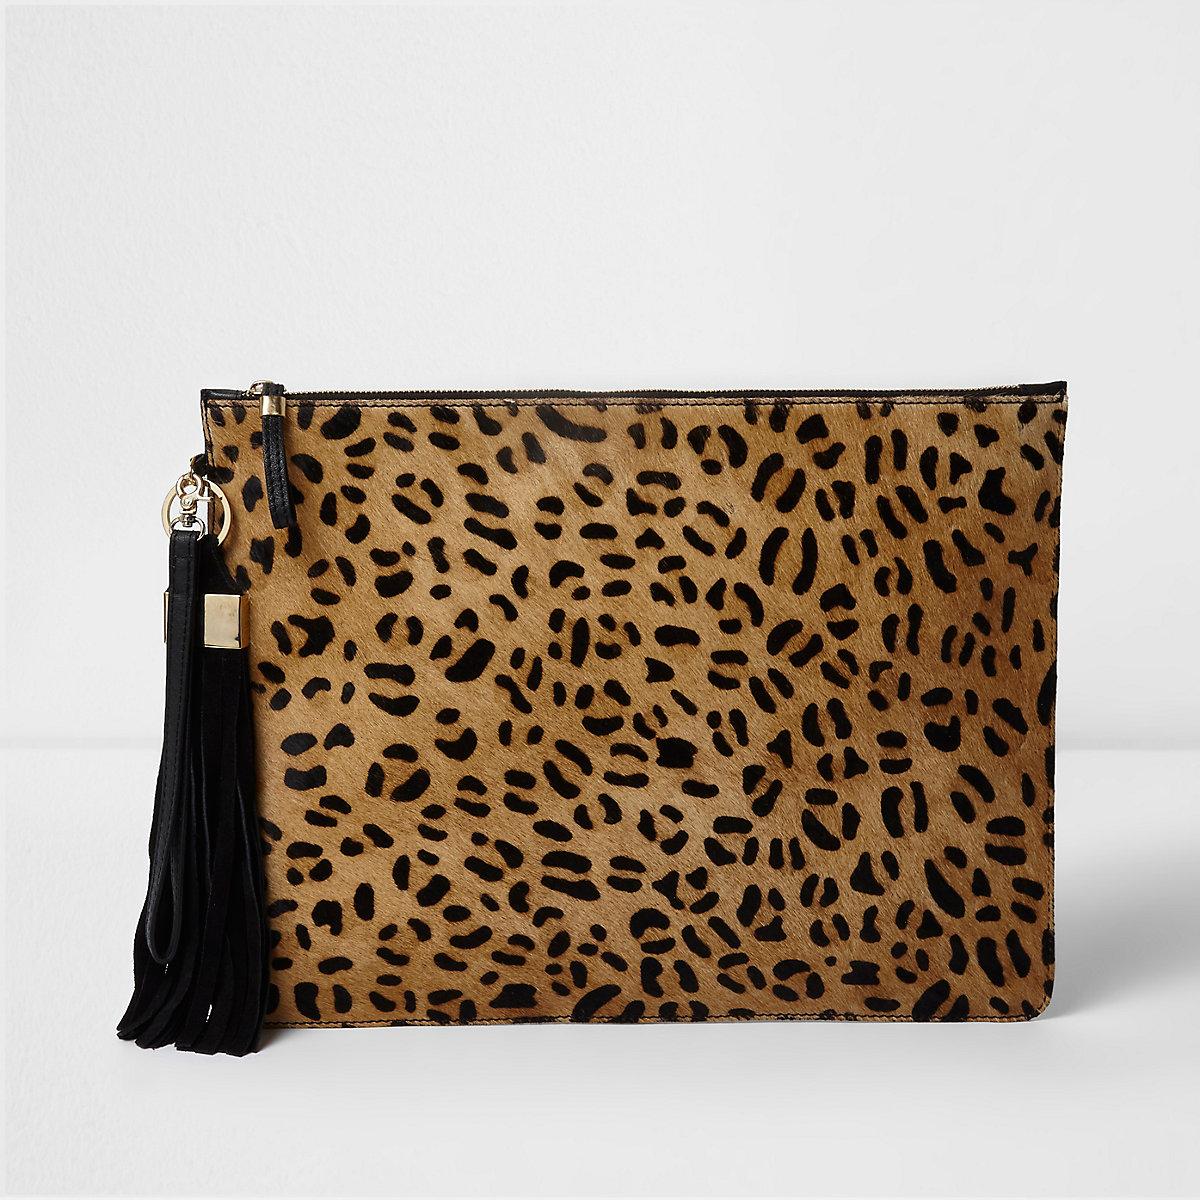 Beige leopard print leather clutch bag - Leather Bags - Bags   Purses -  women 69b222c7e35cc